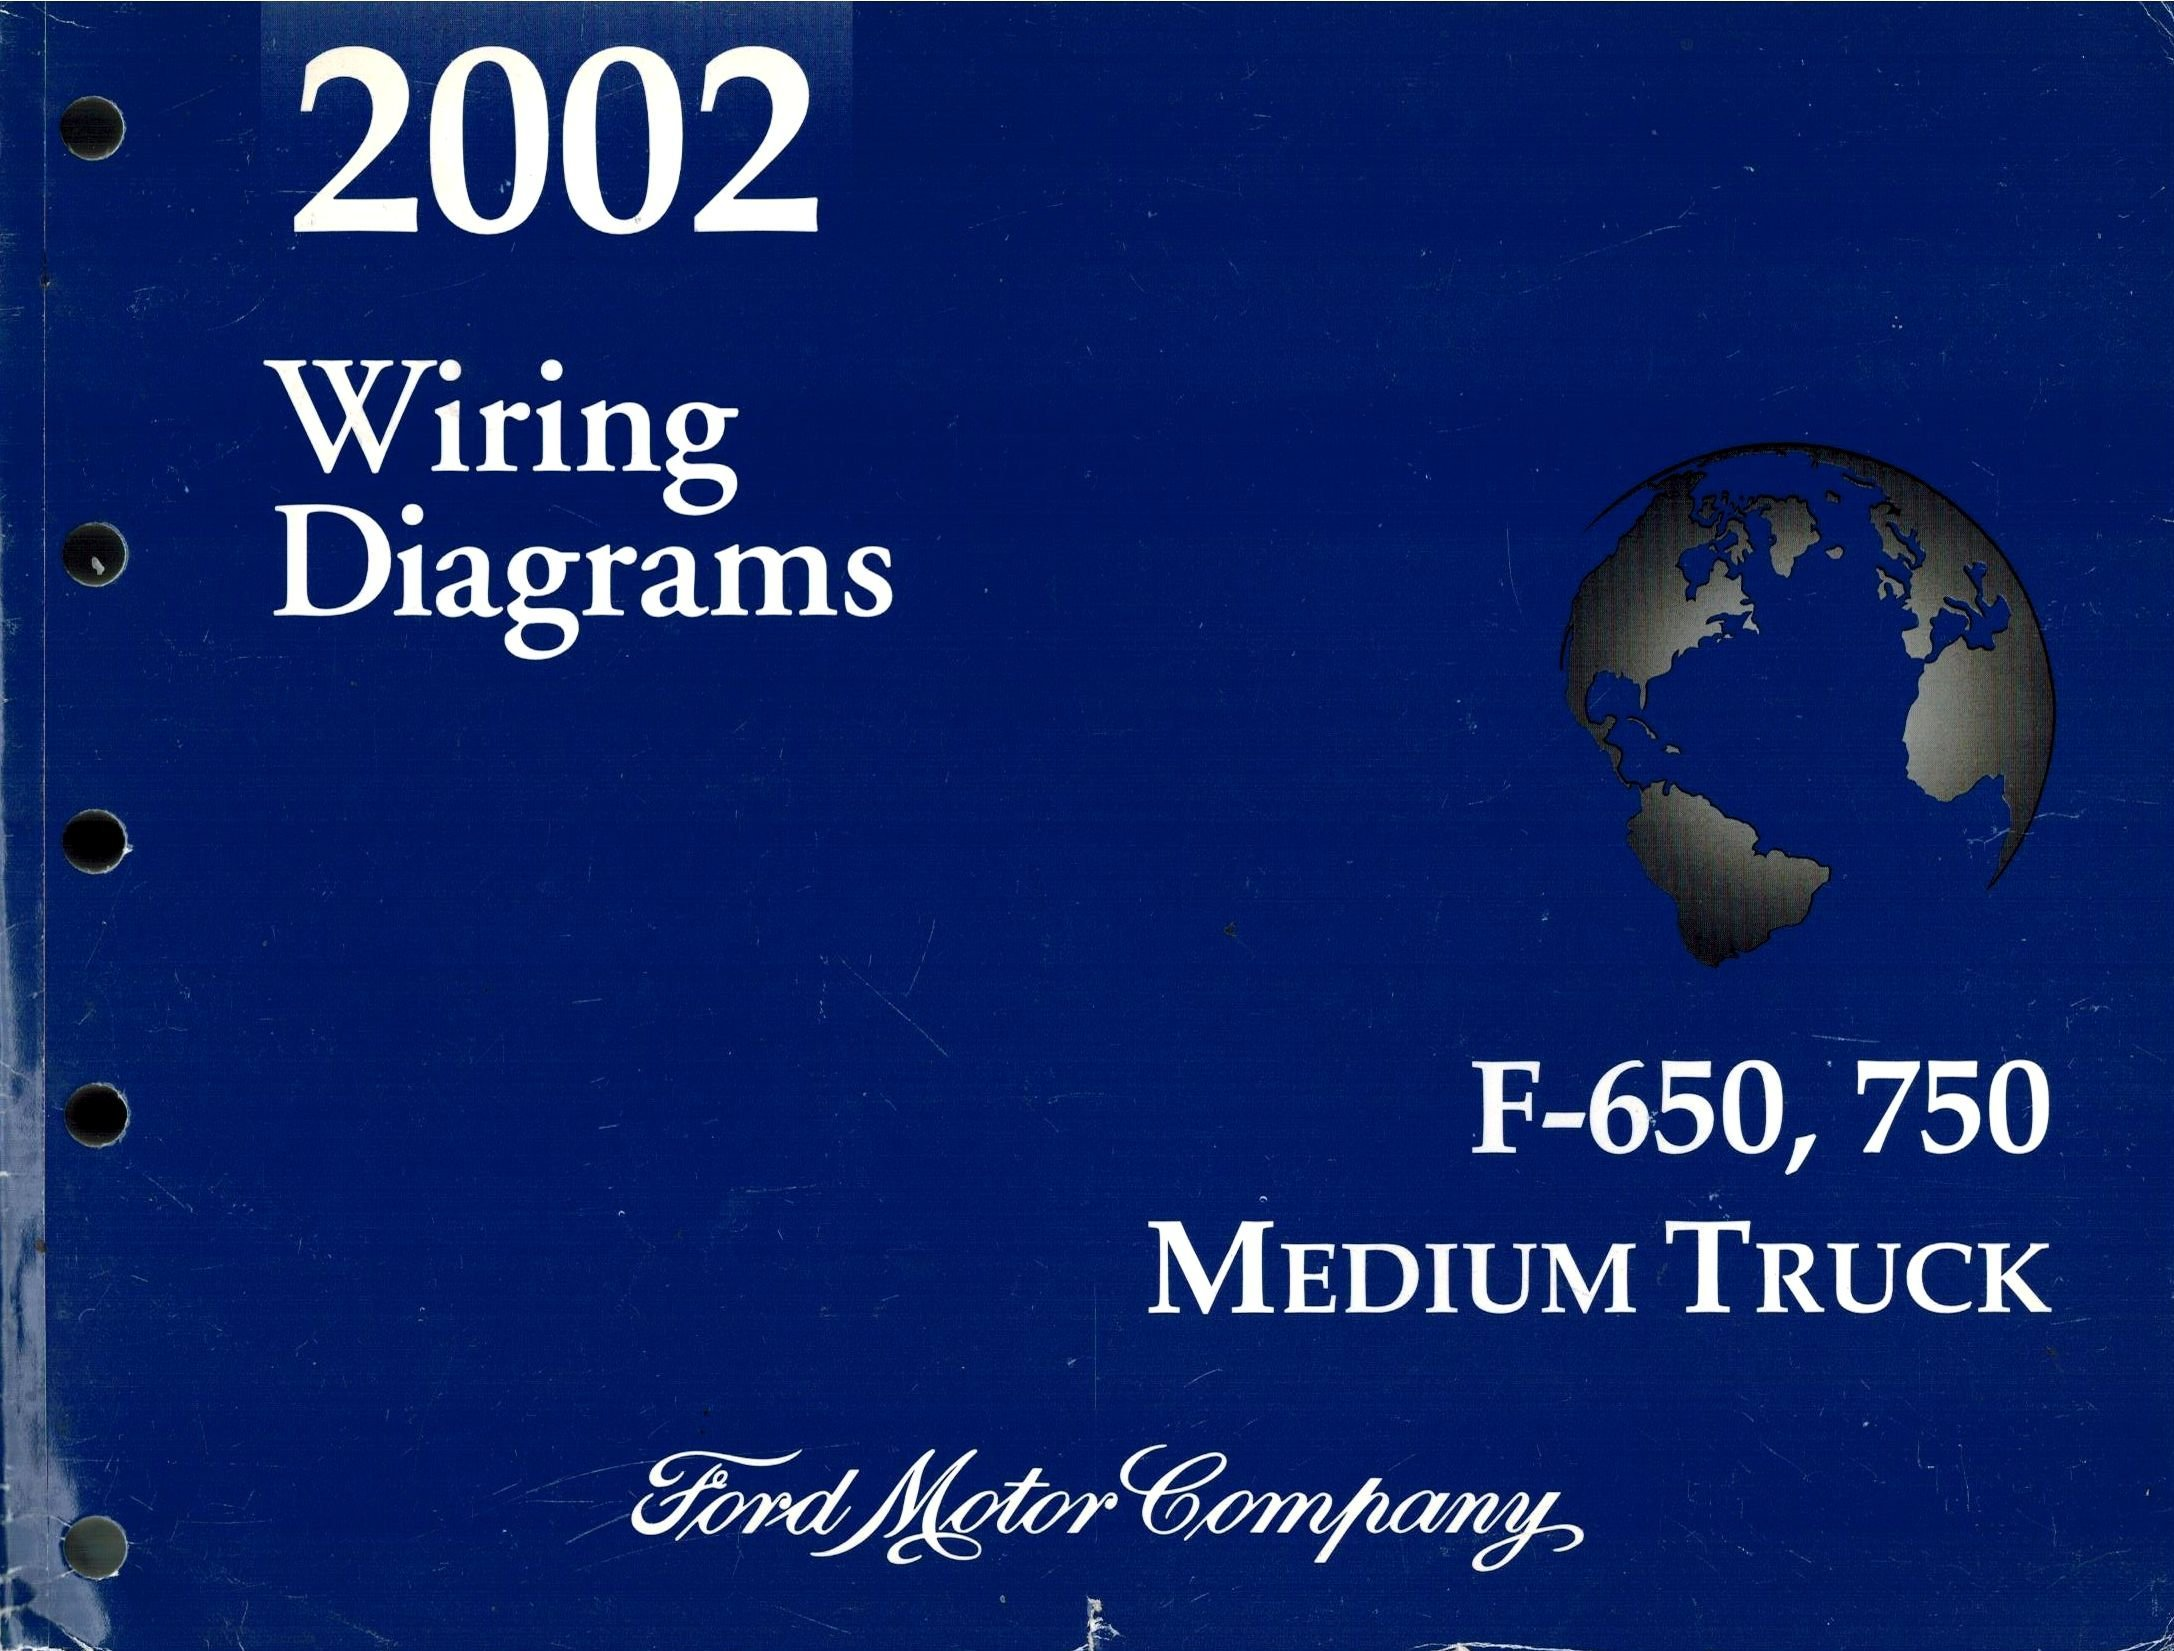 2002 Ford F-650, 750 Medium Truck Wiring Diagram: Ford Motor Company:  Amazon.com: Books